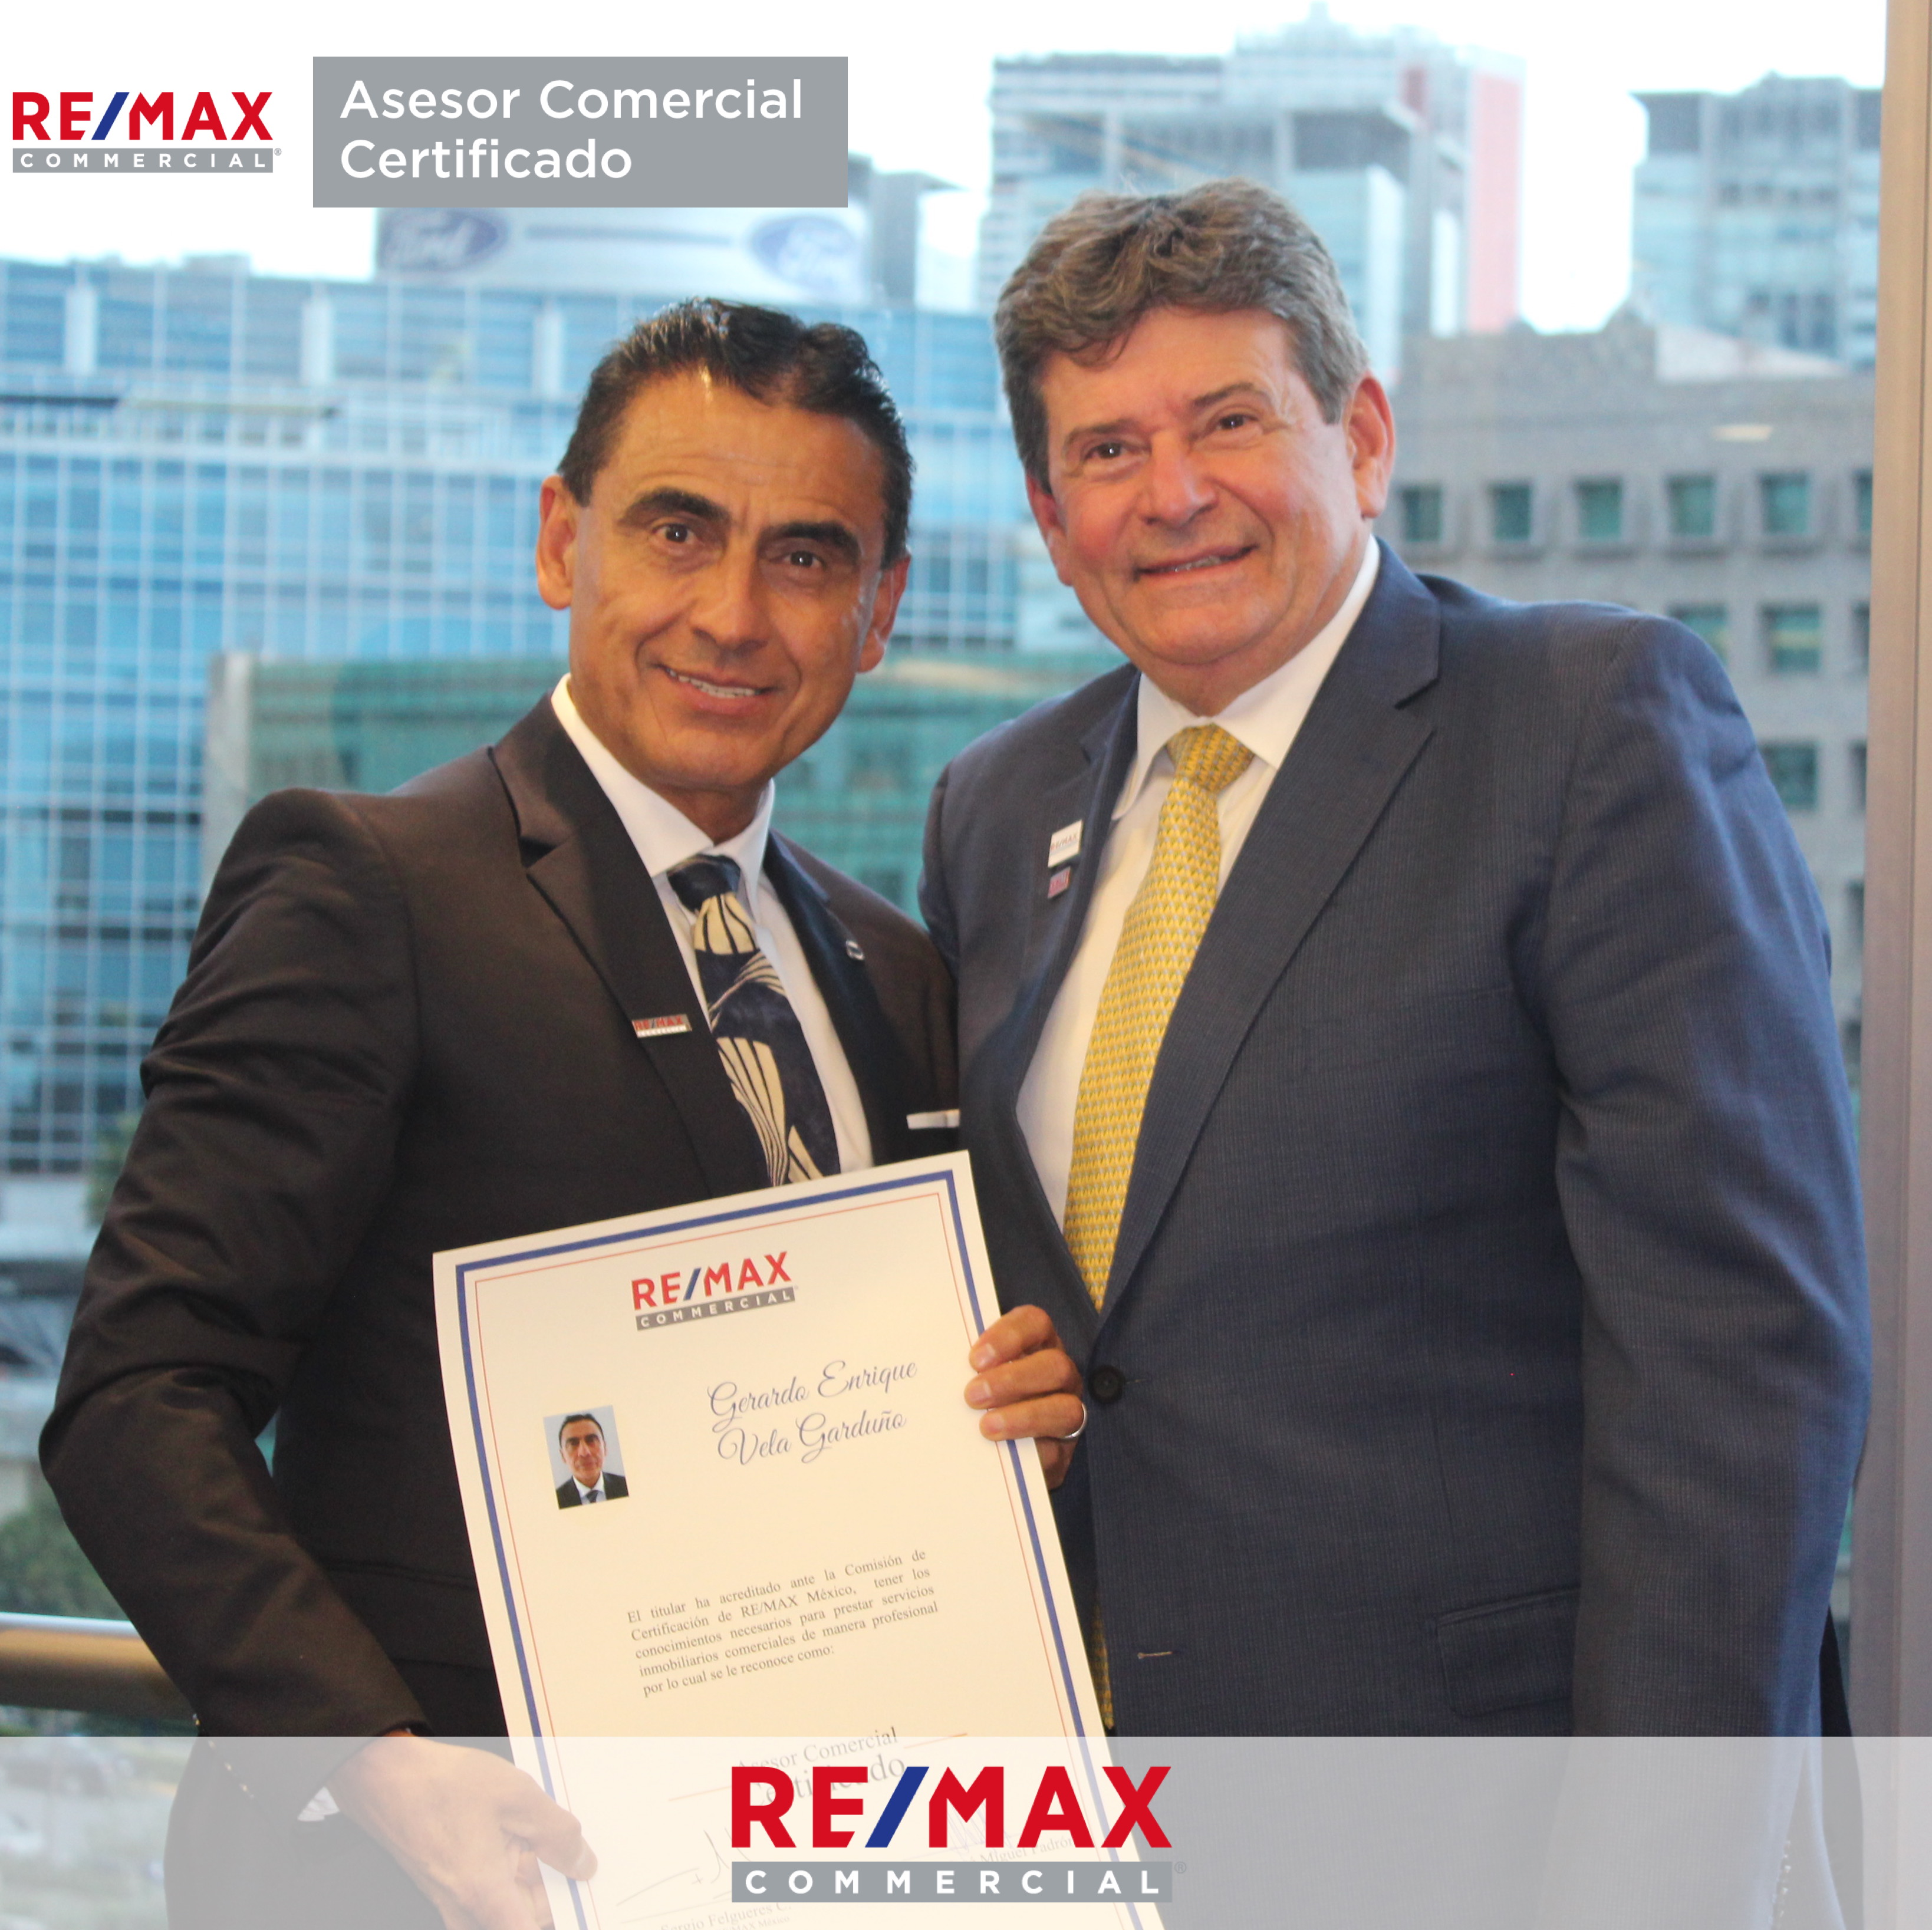 07_Certificacion_comercial_comprar_rentar_vender_casa_departamento_franquicias_inmobiliarias_REMAX_mexico_propiedades_comerciales_terrenos_bodegas